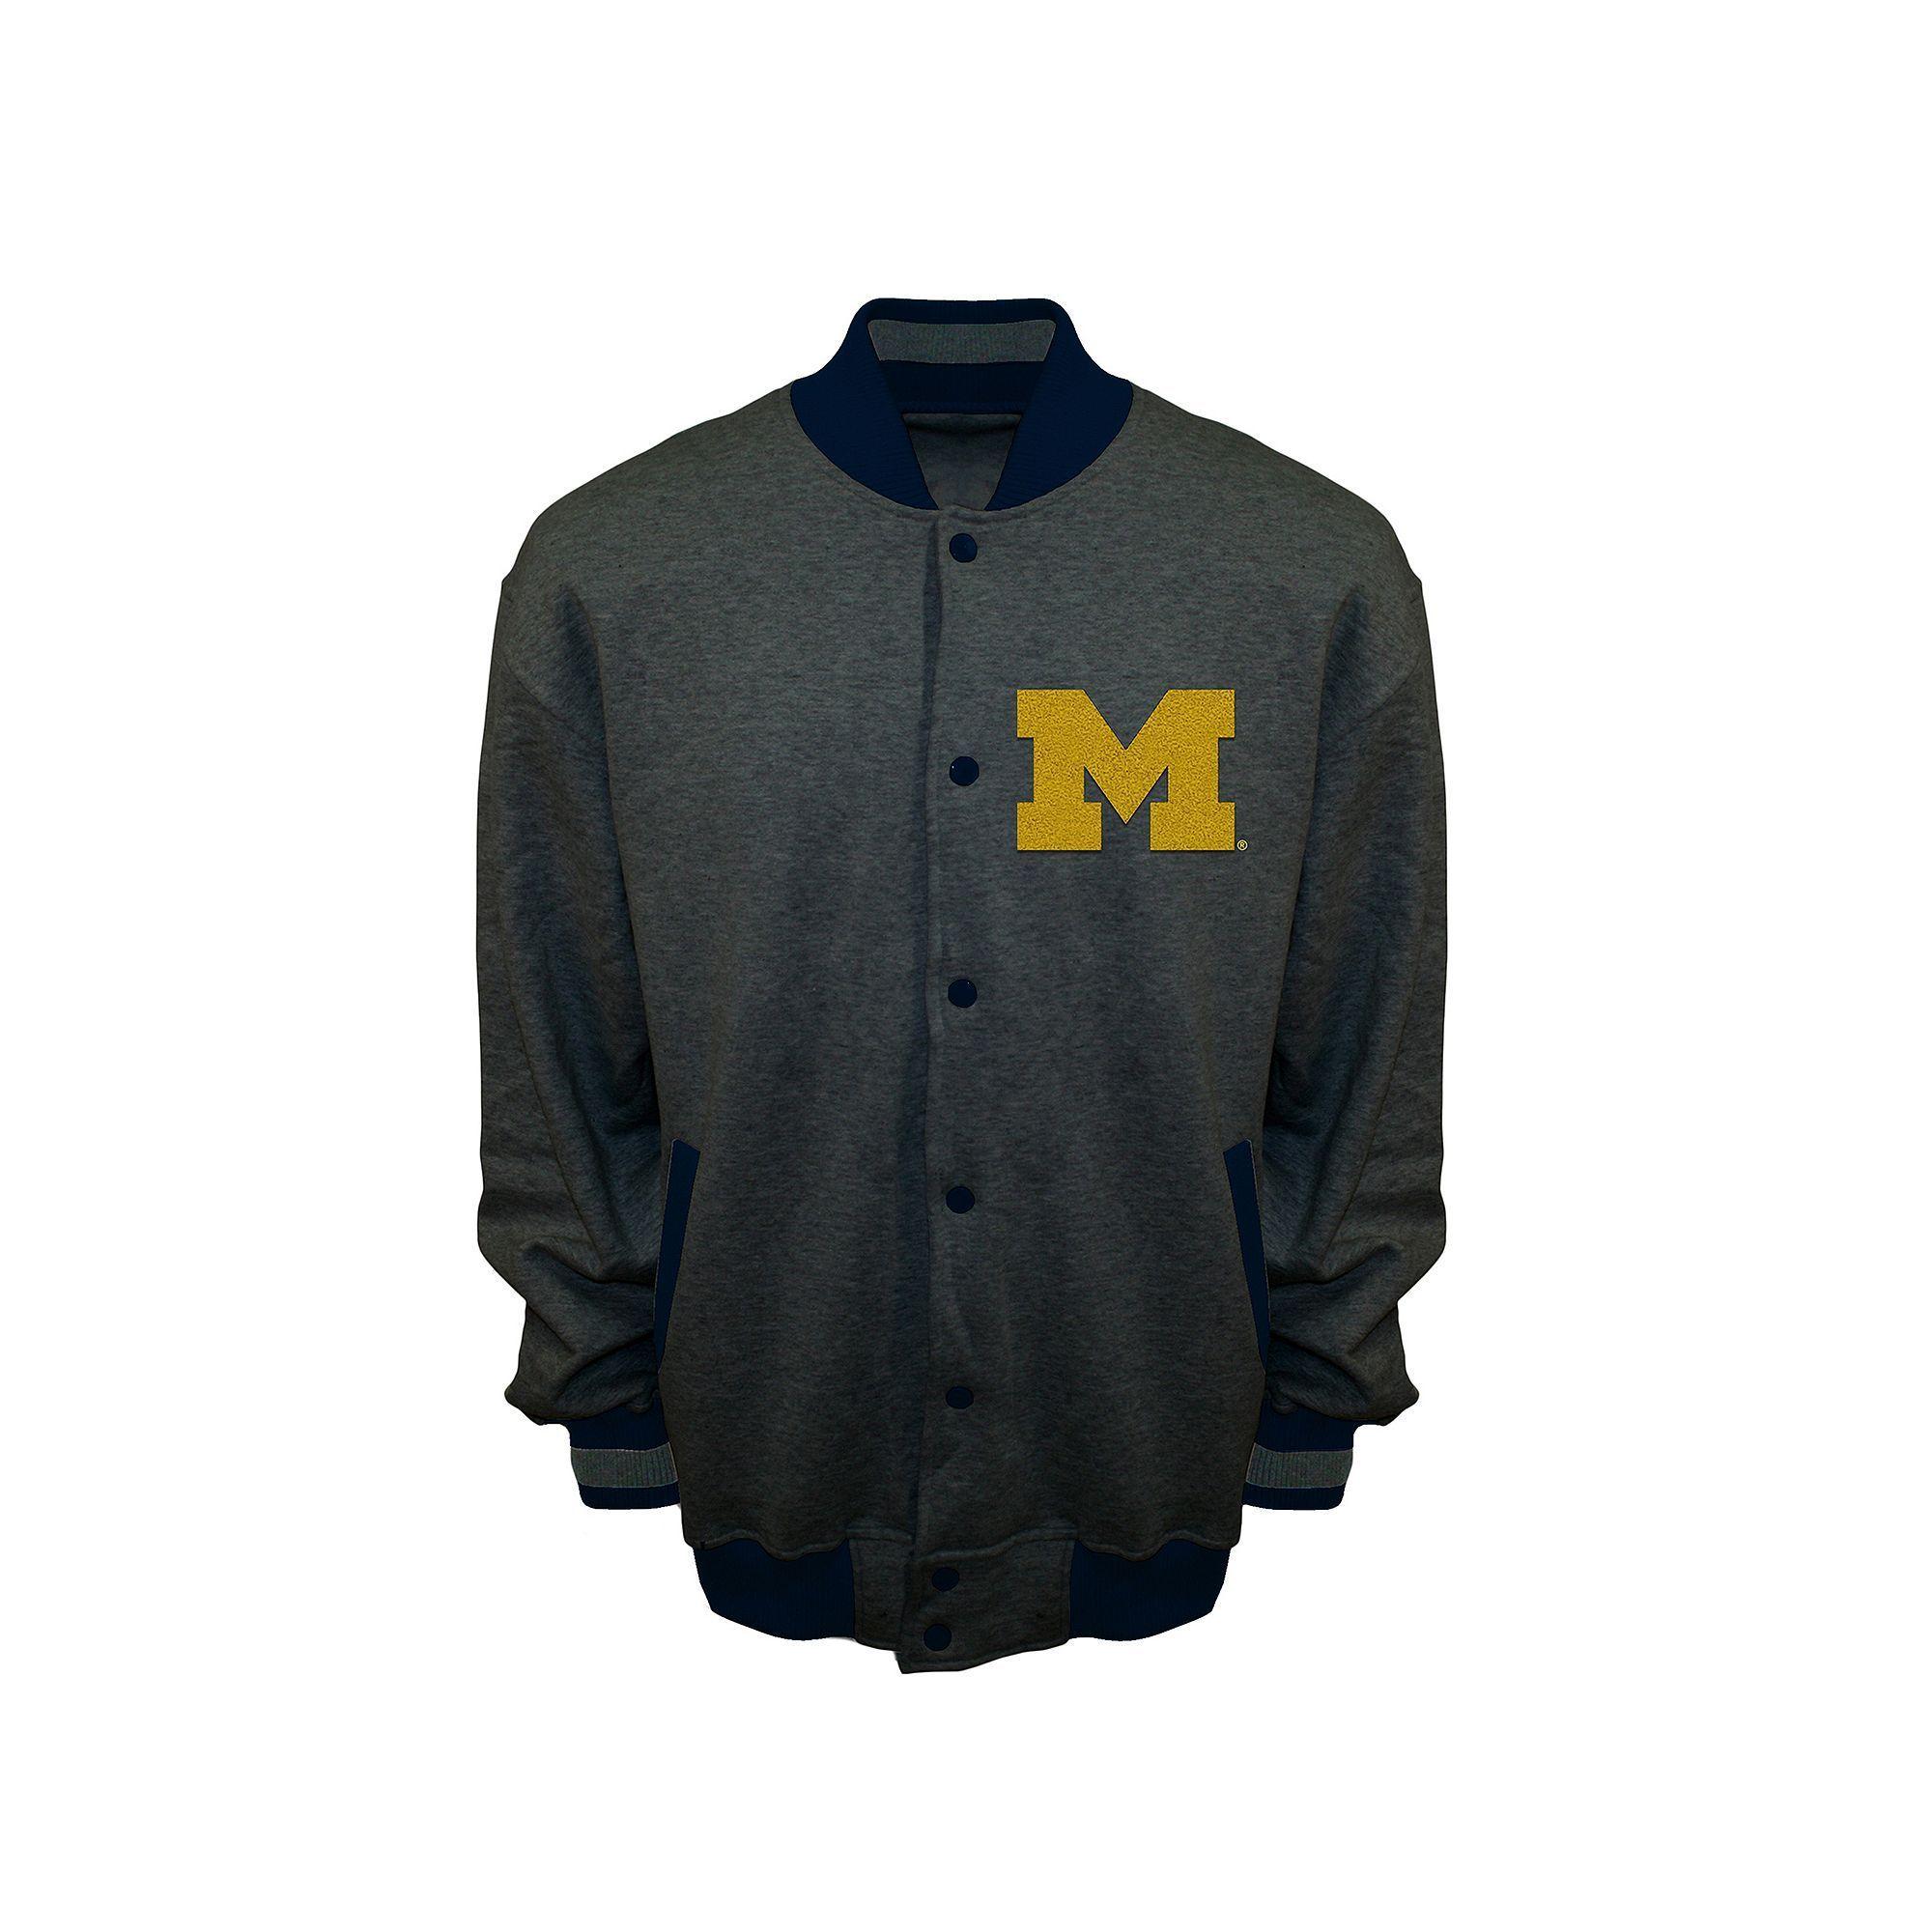 Menus franchise club michigan wolverines classic fleece jacket size